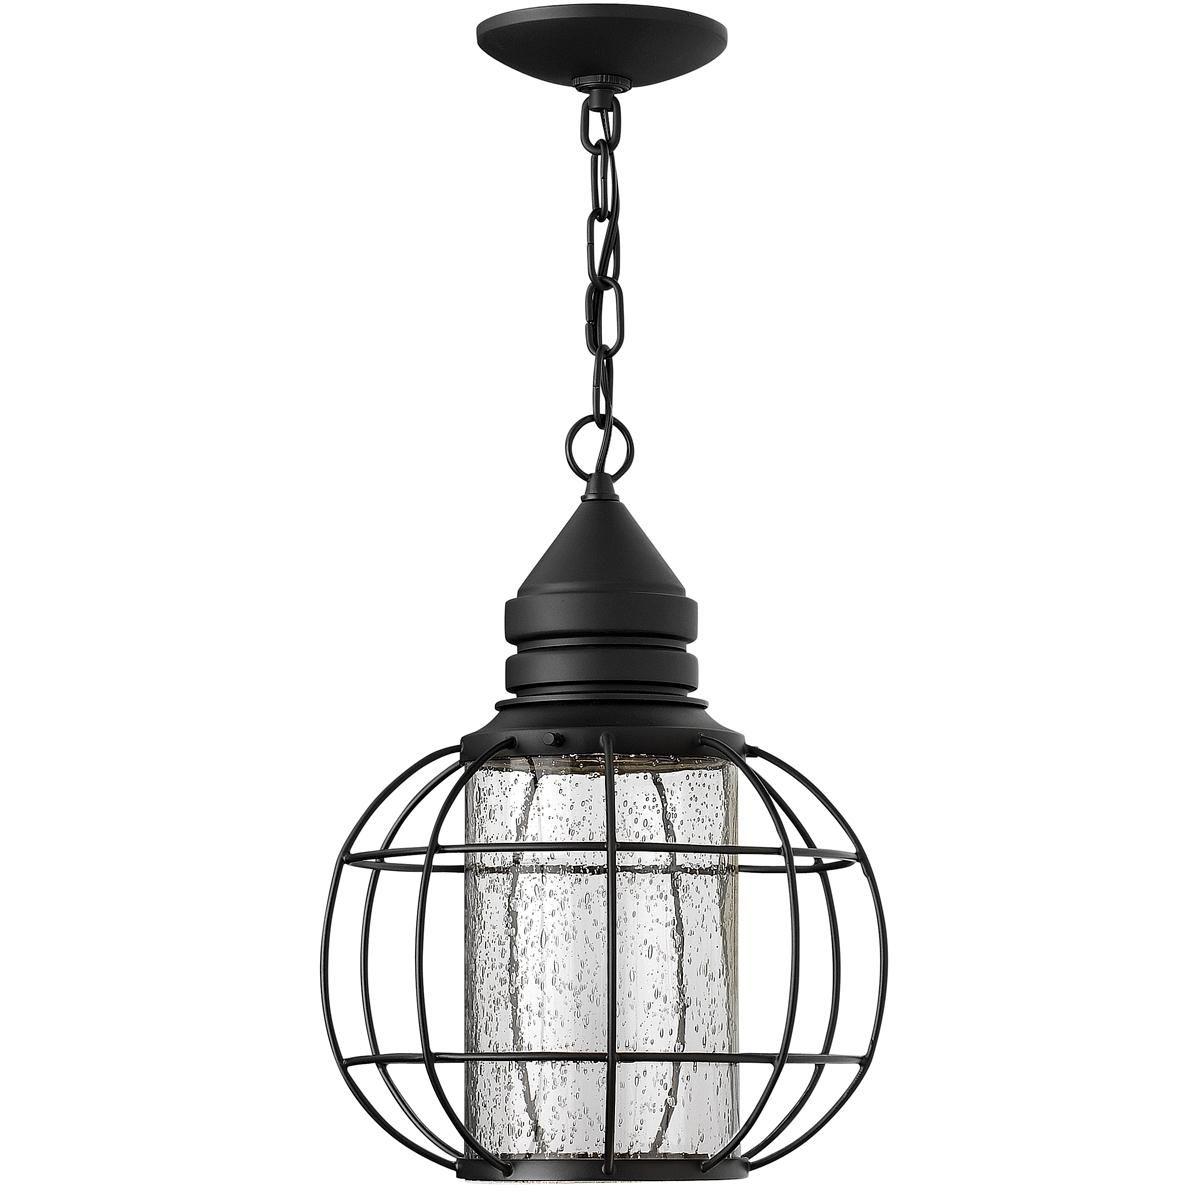 Modern Cape Cod Onion Hanging Lantern | Cod, Hanging Lanterns And Cape For Modern Latern Hinkley Lighting (View 13 of 15)